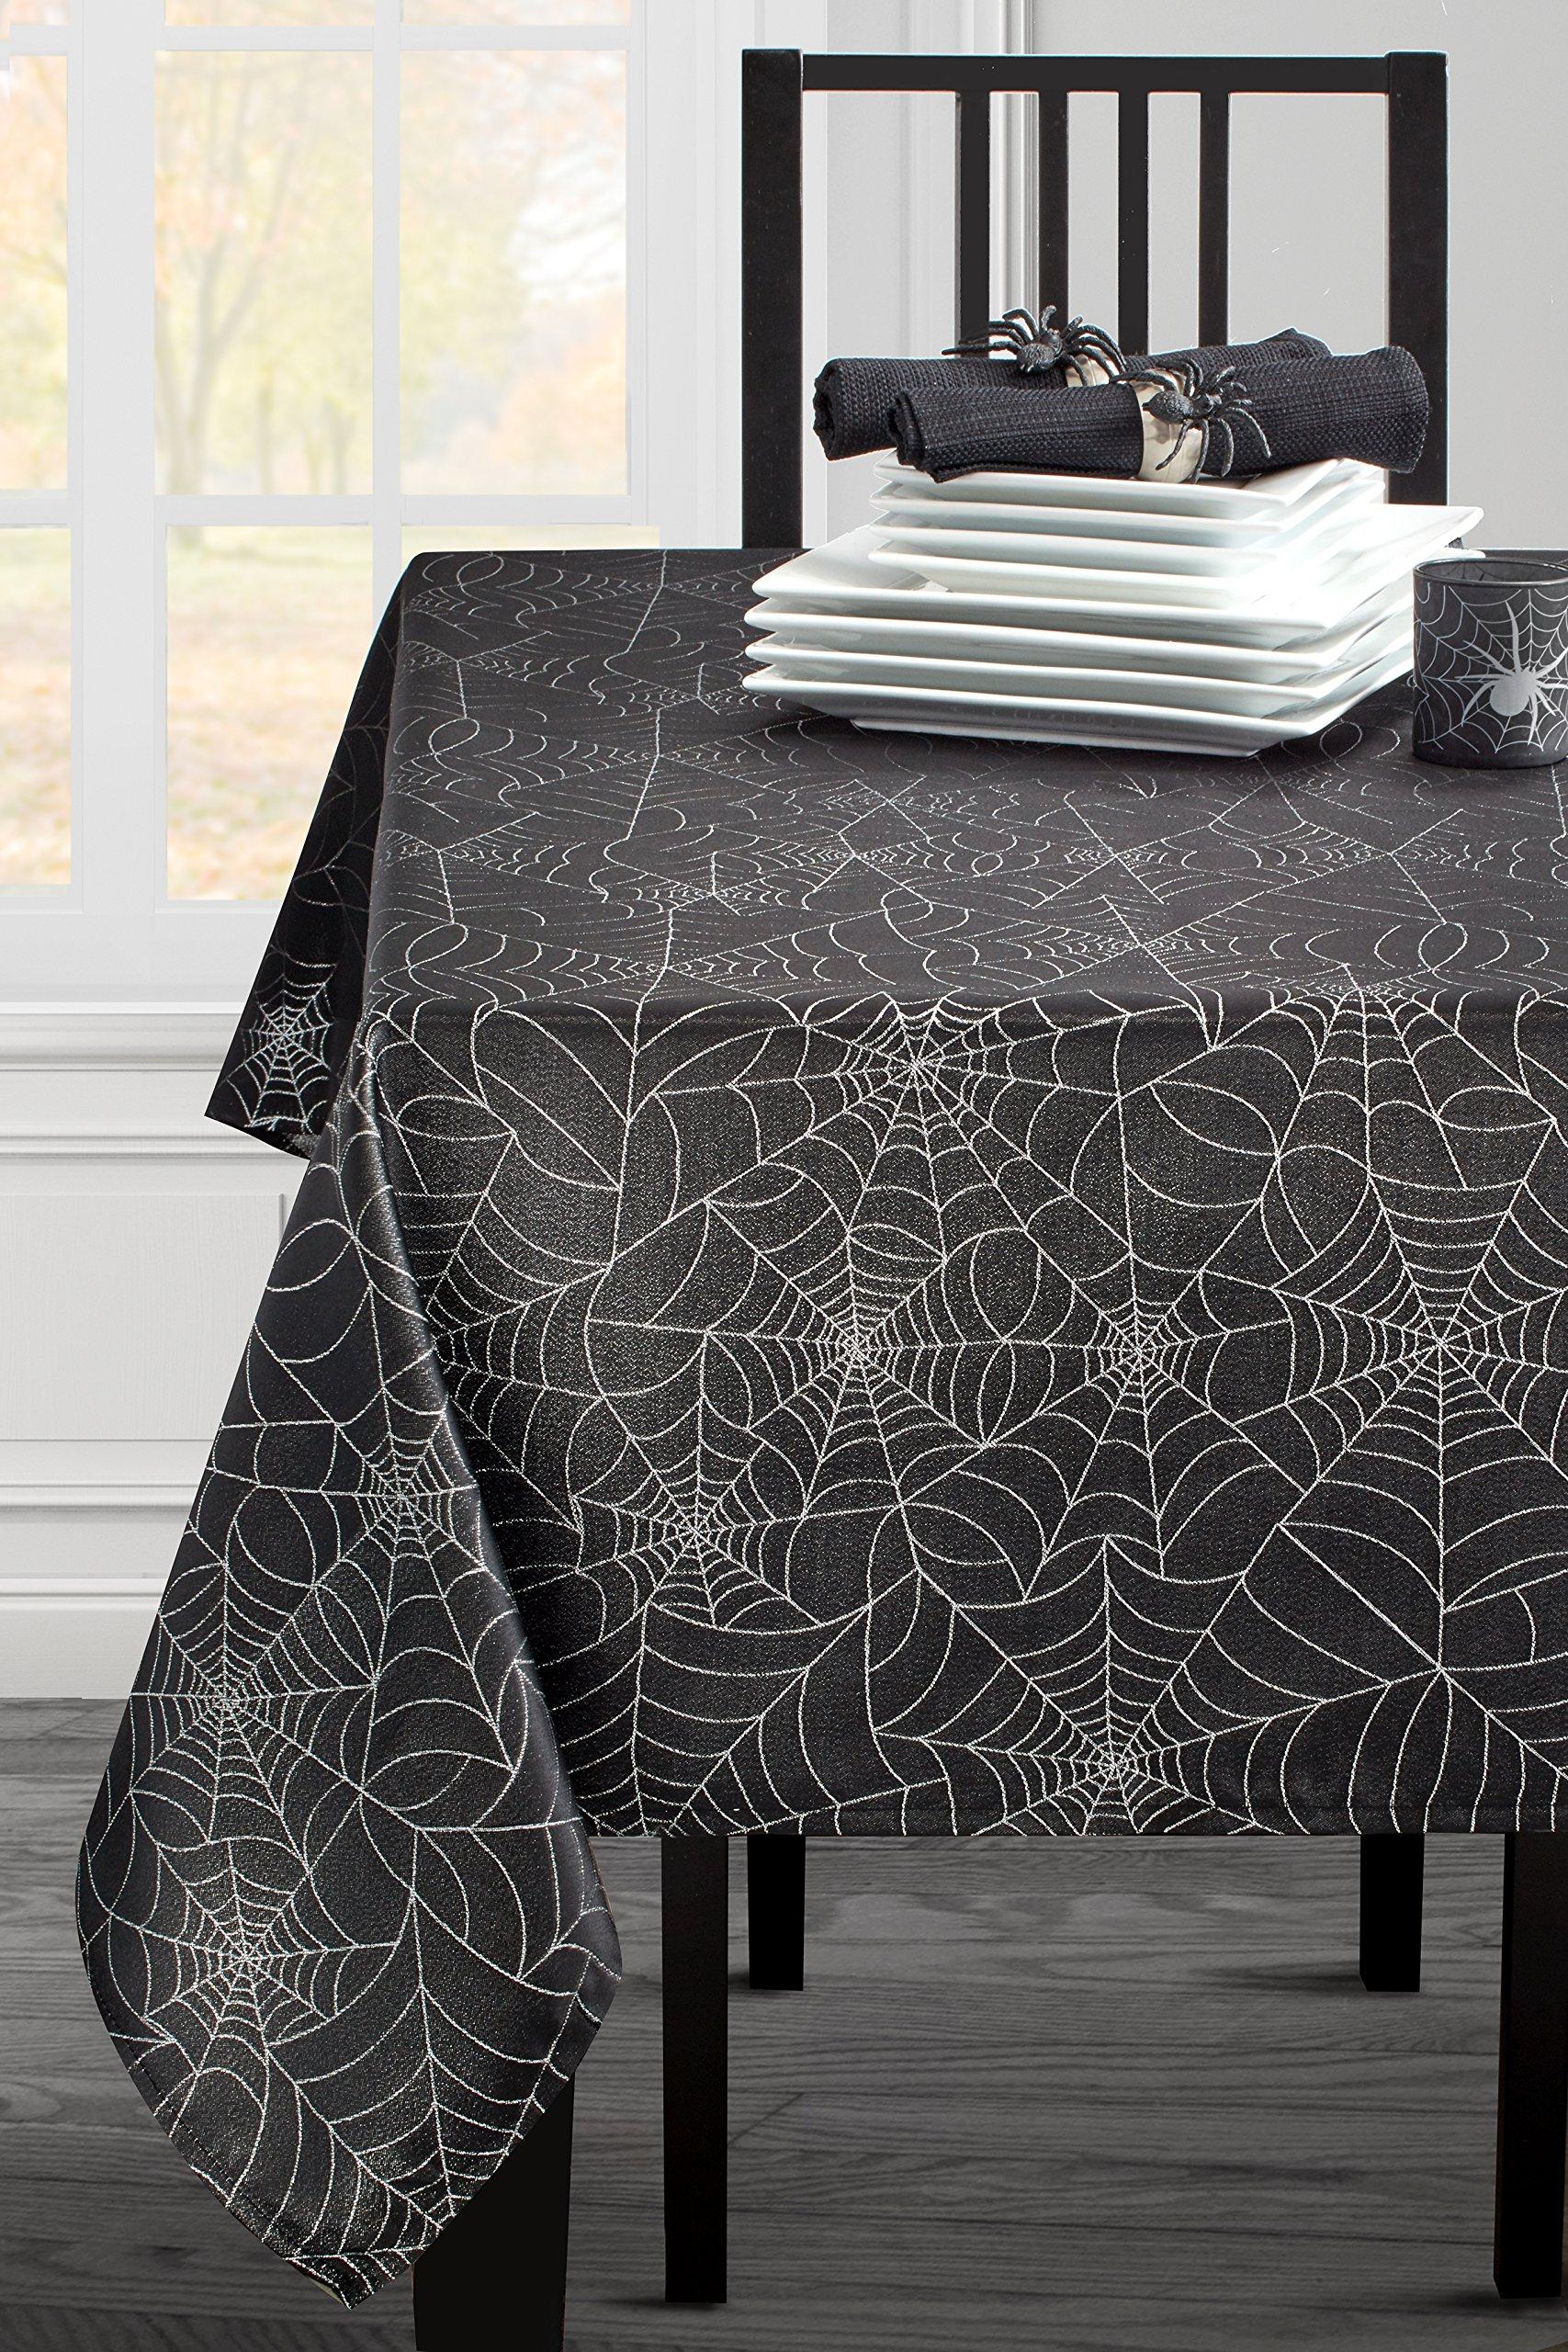 Benson Mills Twinkle Halloween Spider Web Fabric Metallic Tablecloth (Black, 60'' X 84'' Rectangular)